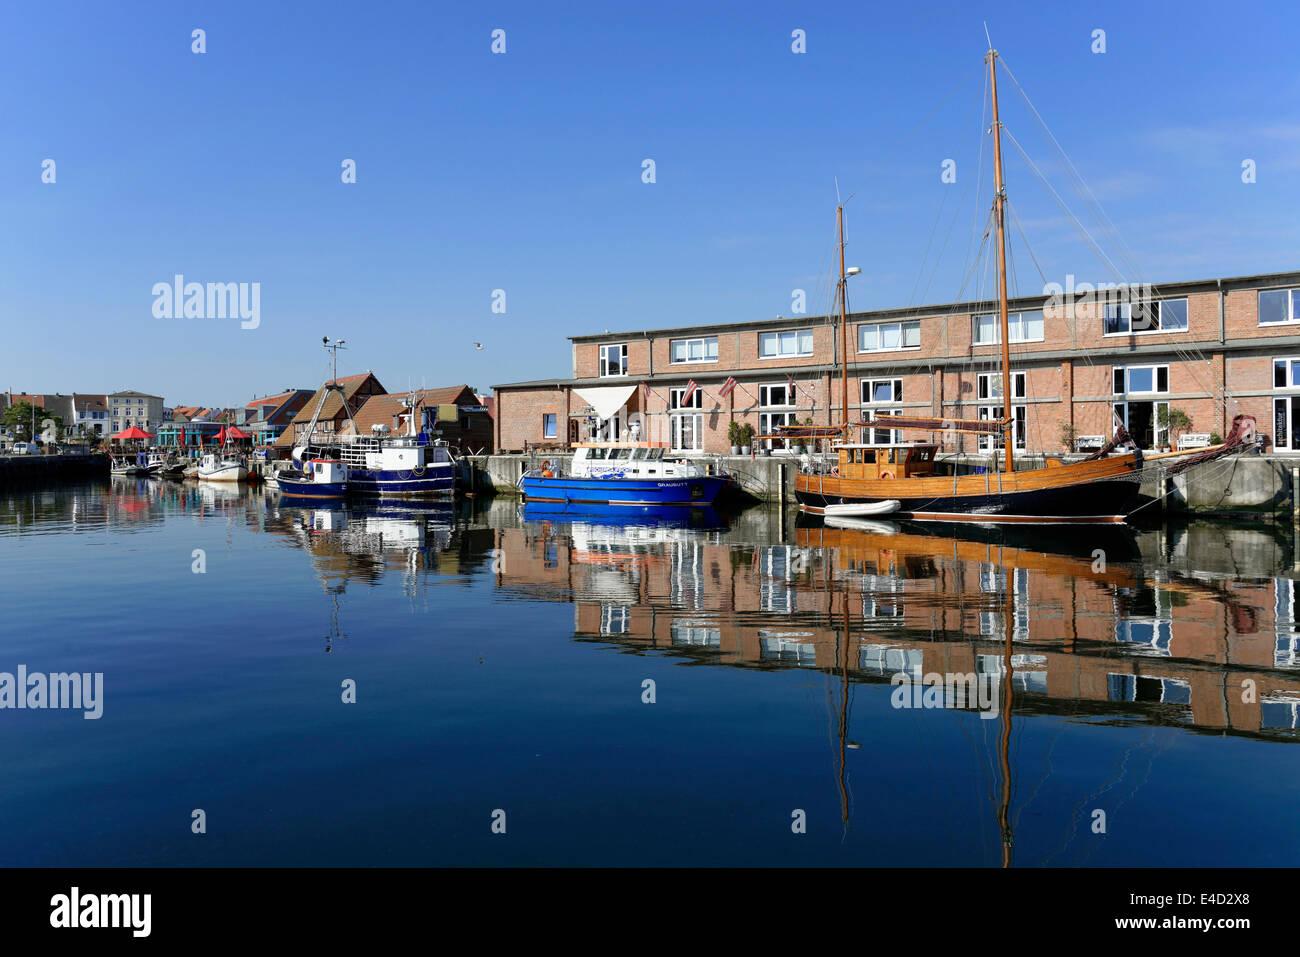 Old harbour, Wismar, Mecklenburg-Western Pomerania, Germany - Stock Image